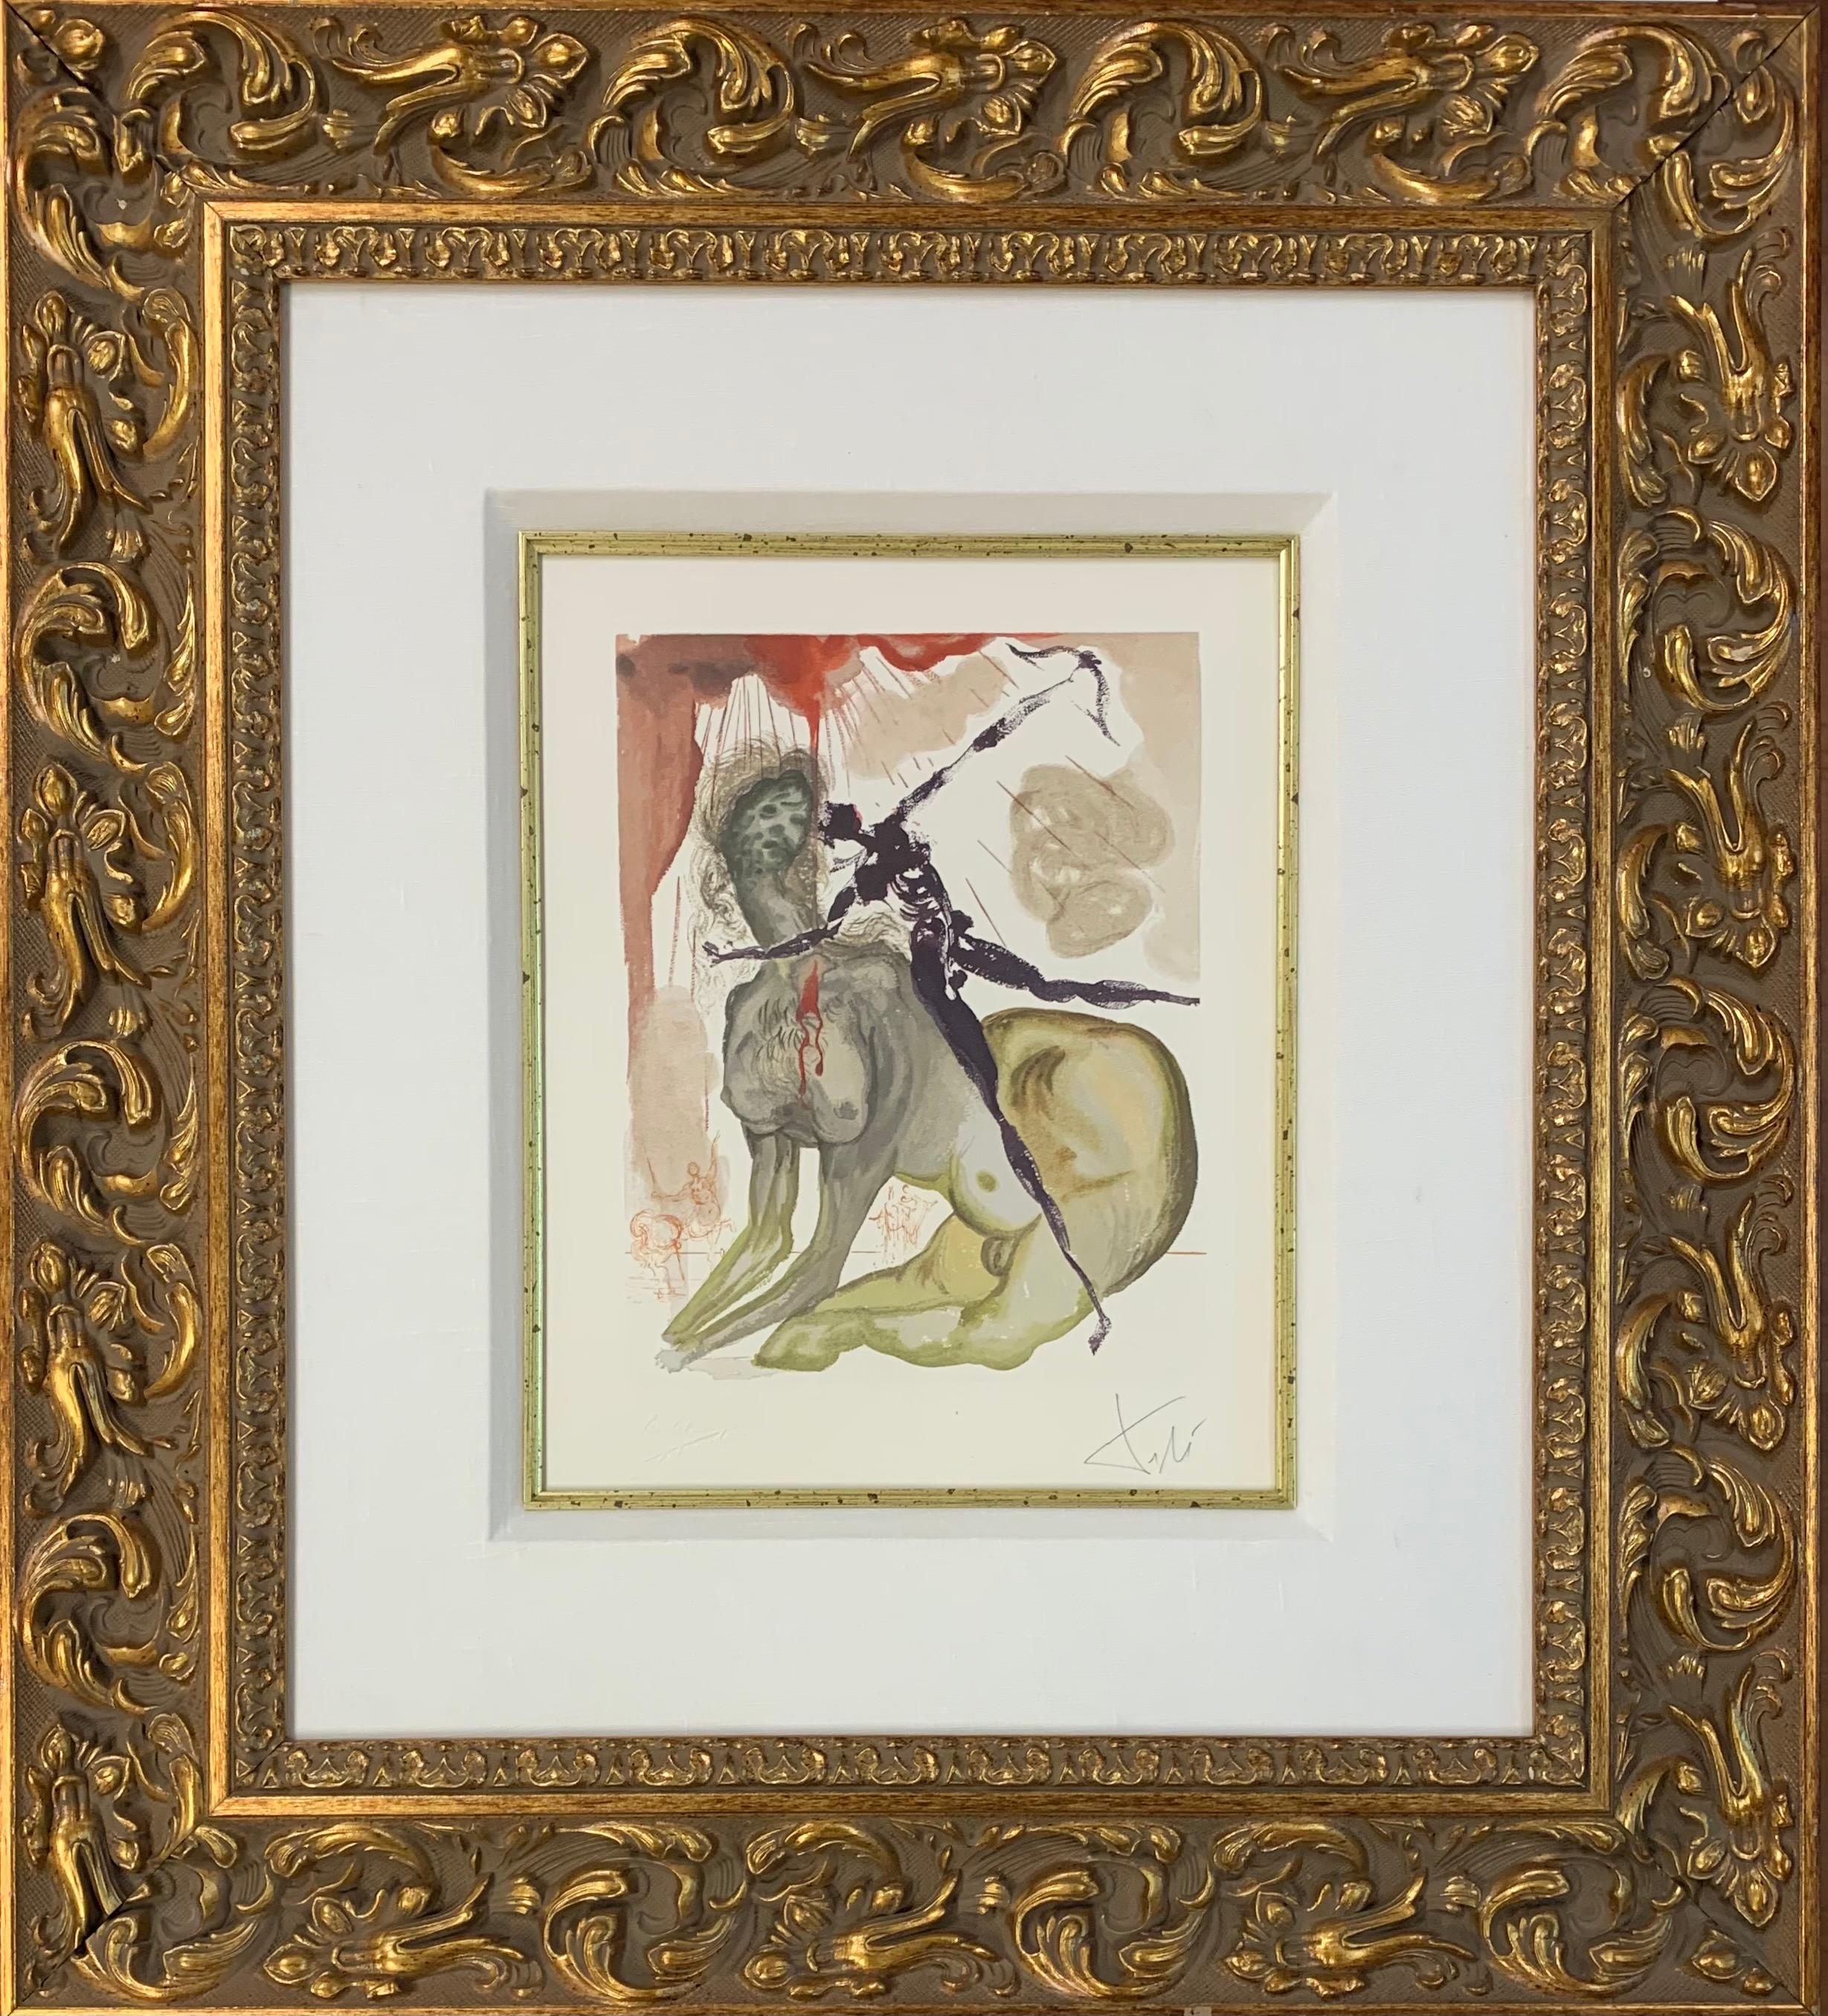 Divine Comedy, Inferno Canto 12, Original Surrealist Woodcut Print